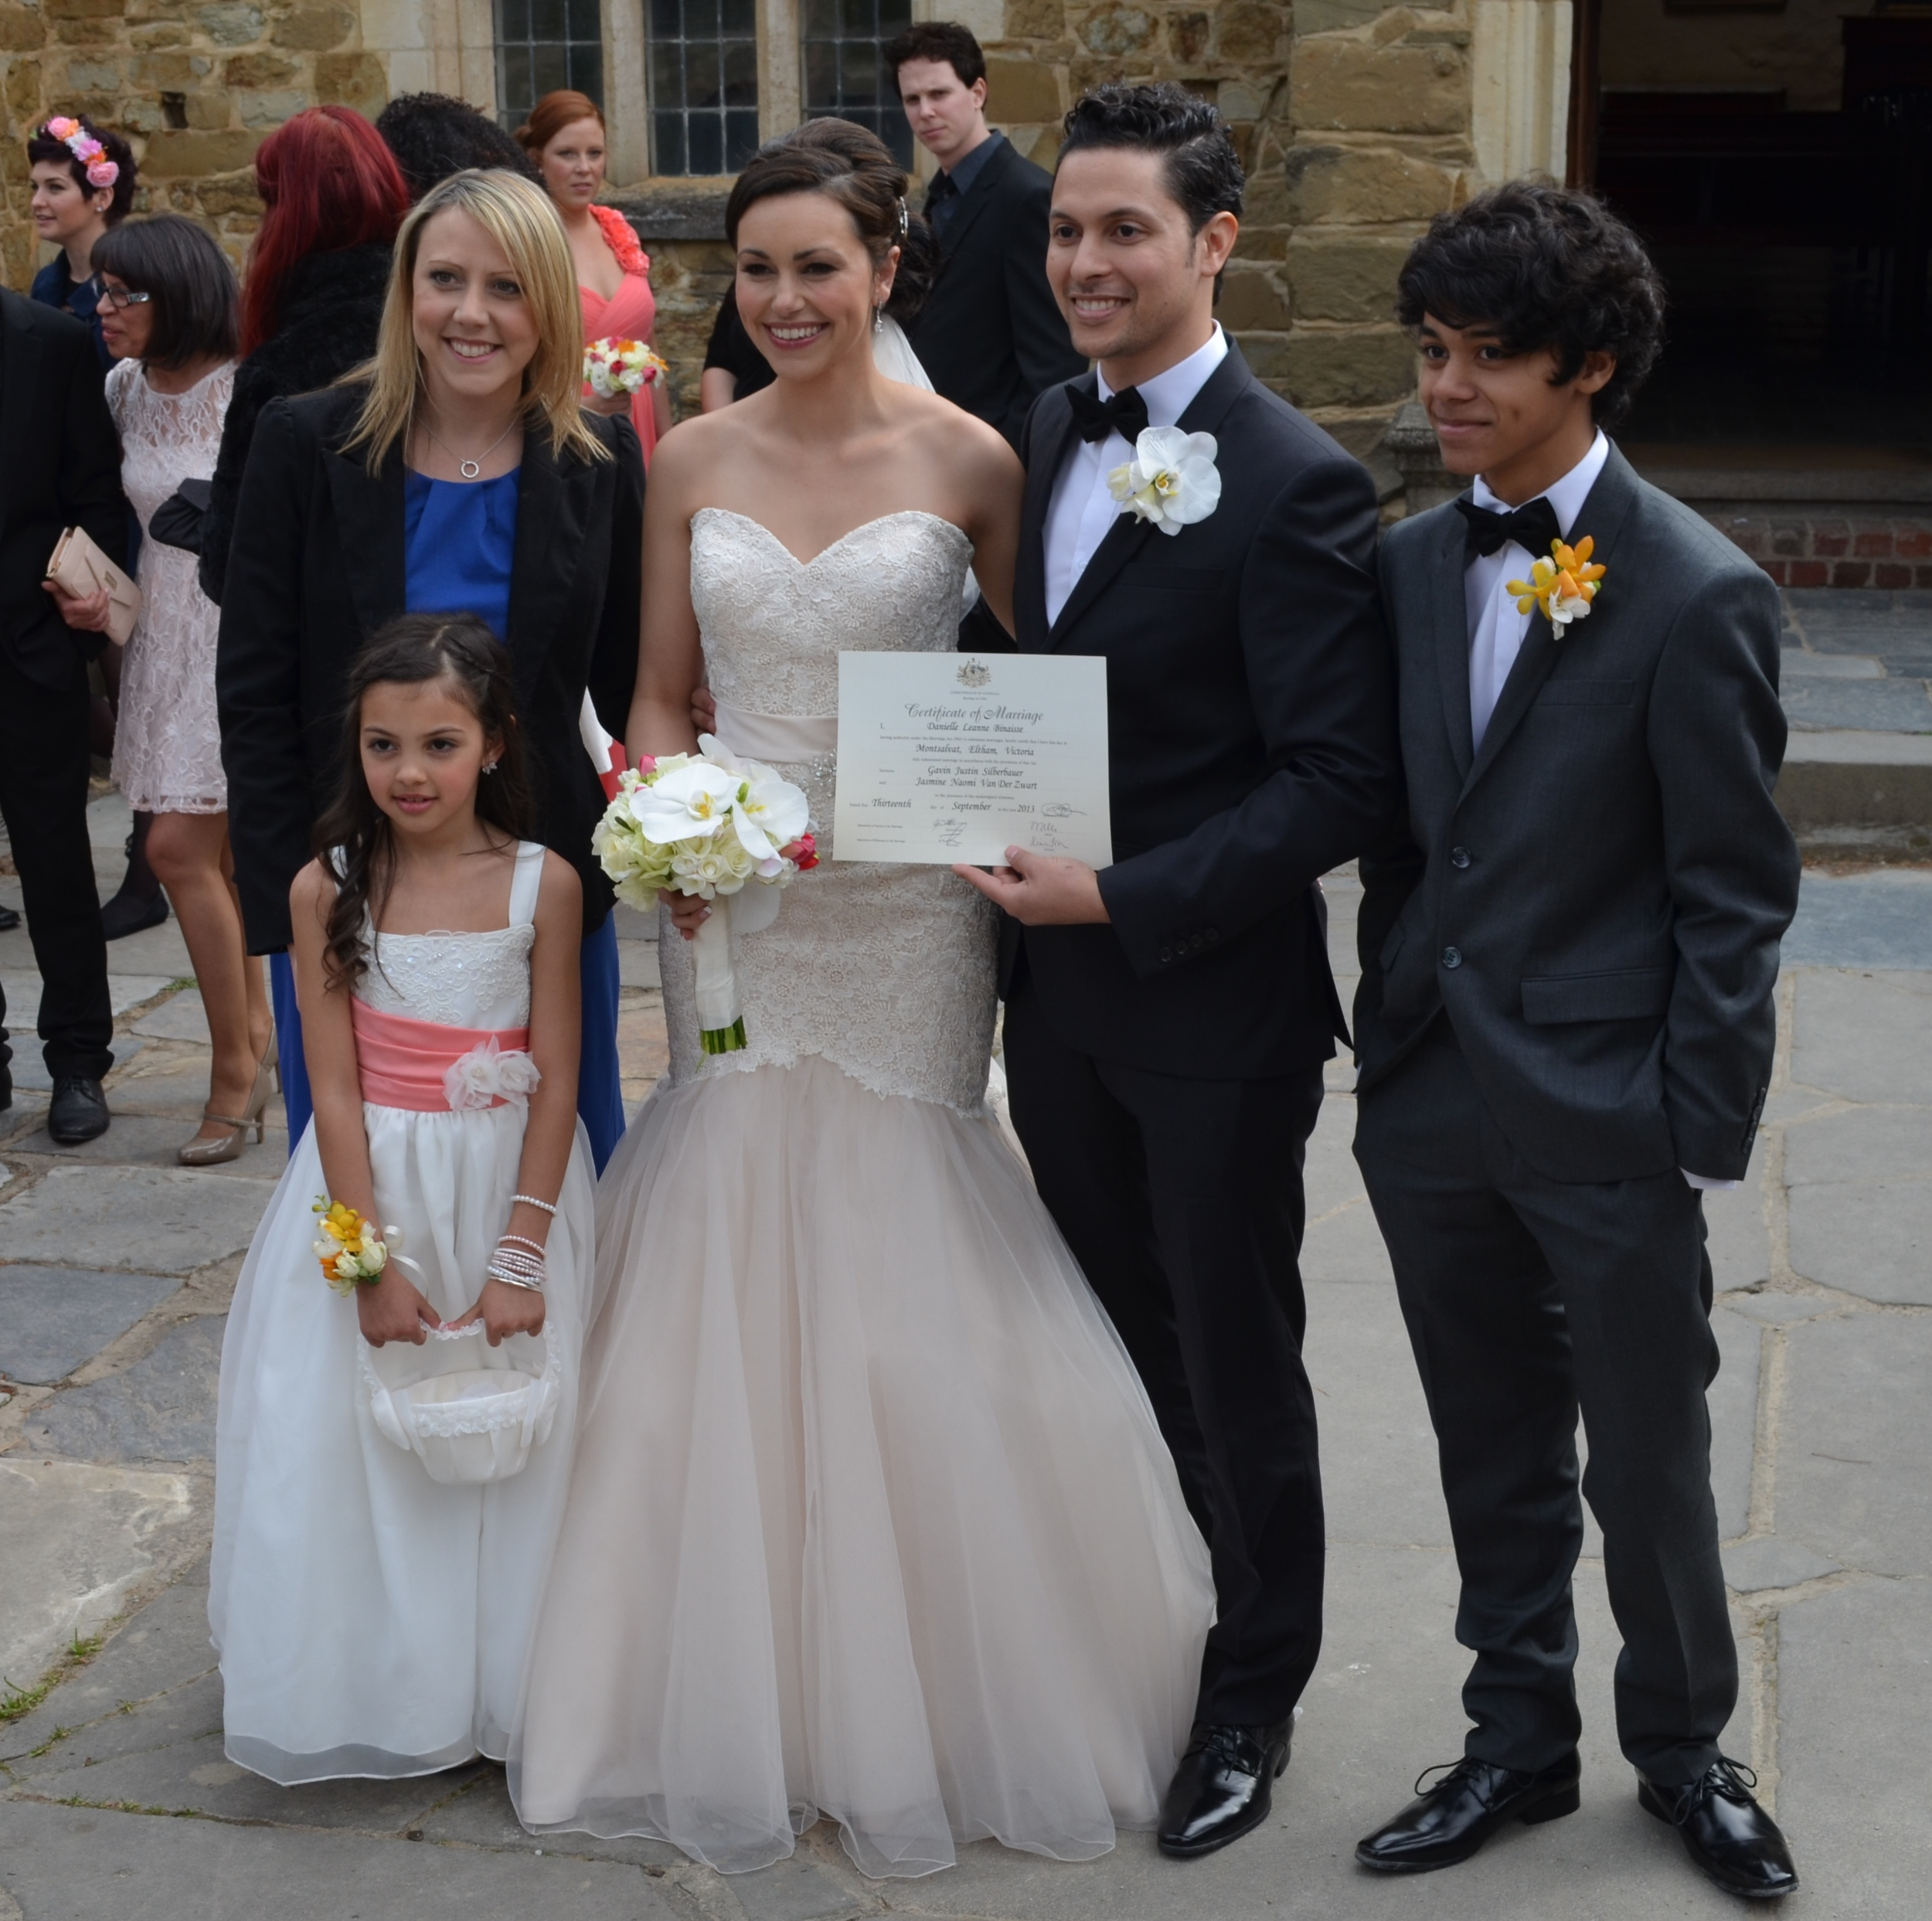 Jasmine & Gavin, Montsalvat, Eltham, 2013.